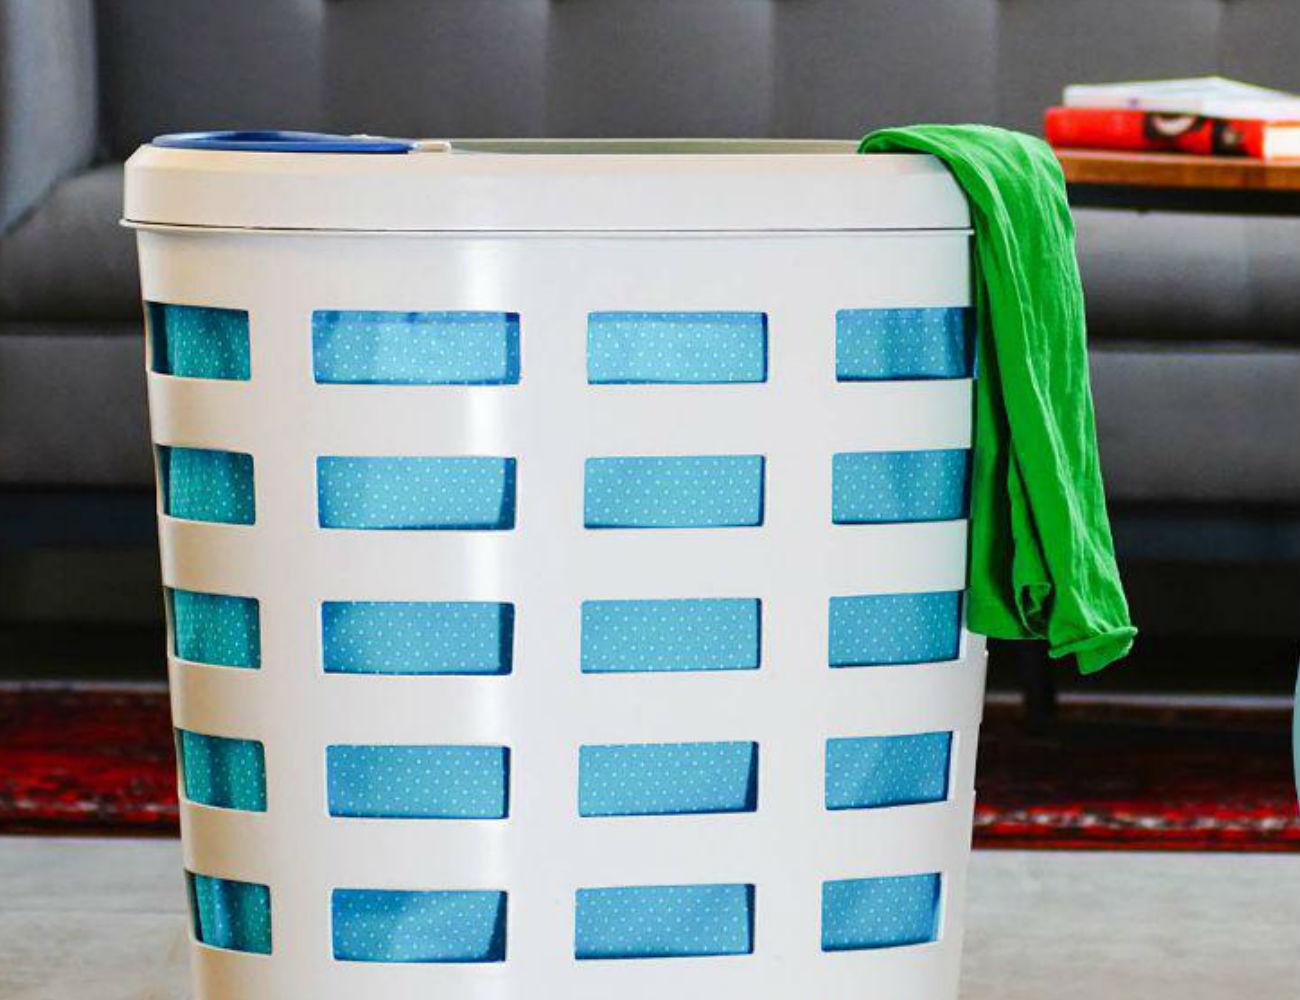 LaunderPal Smart Laundry Basket